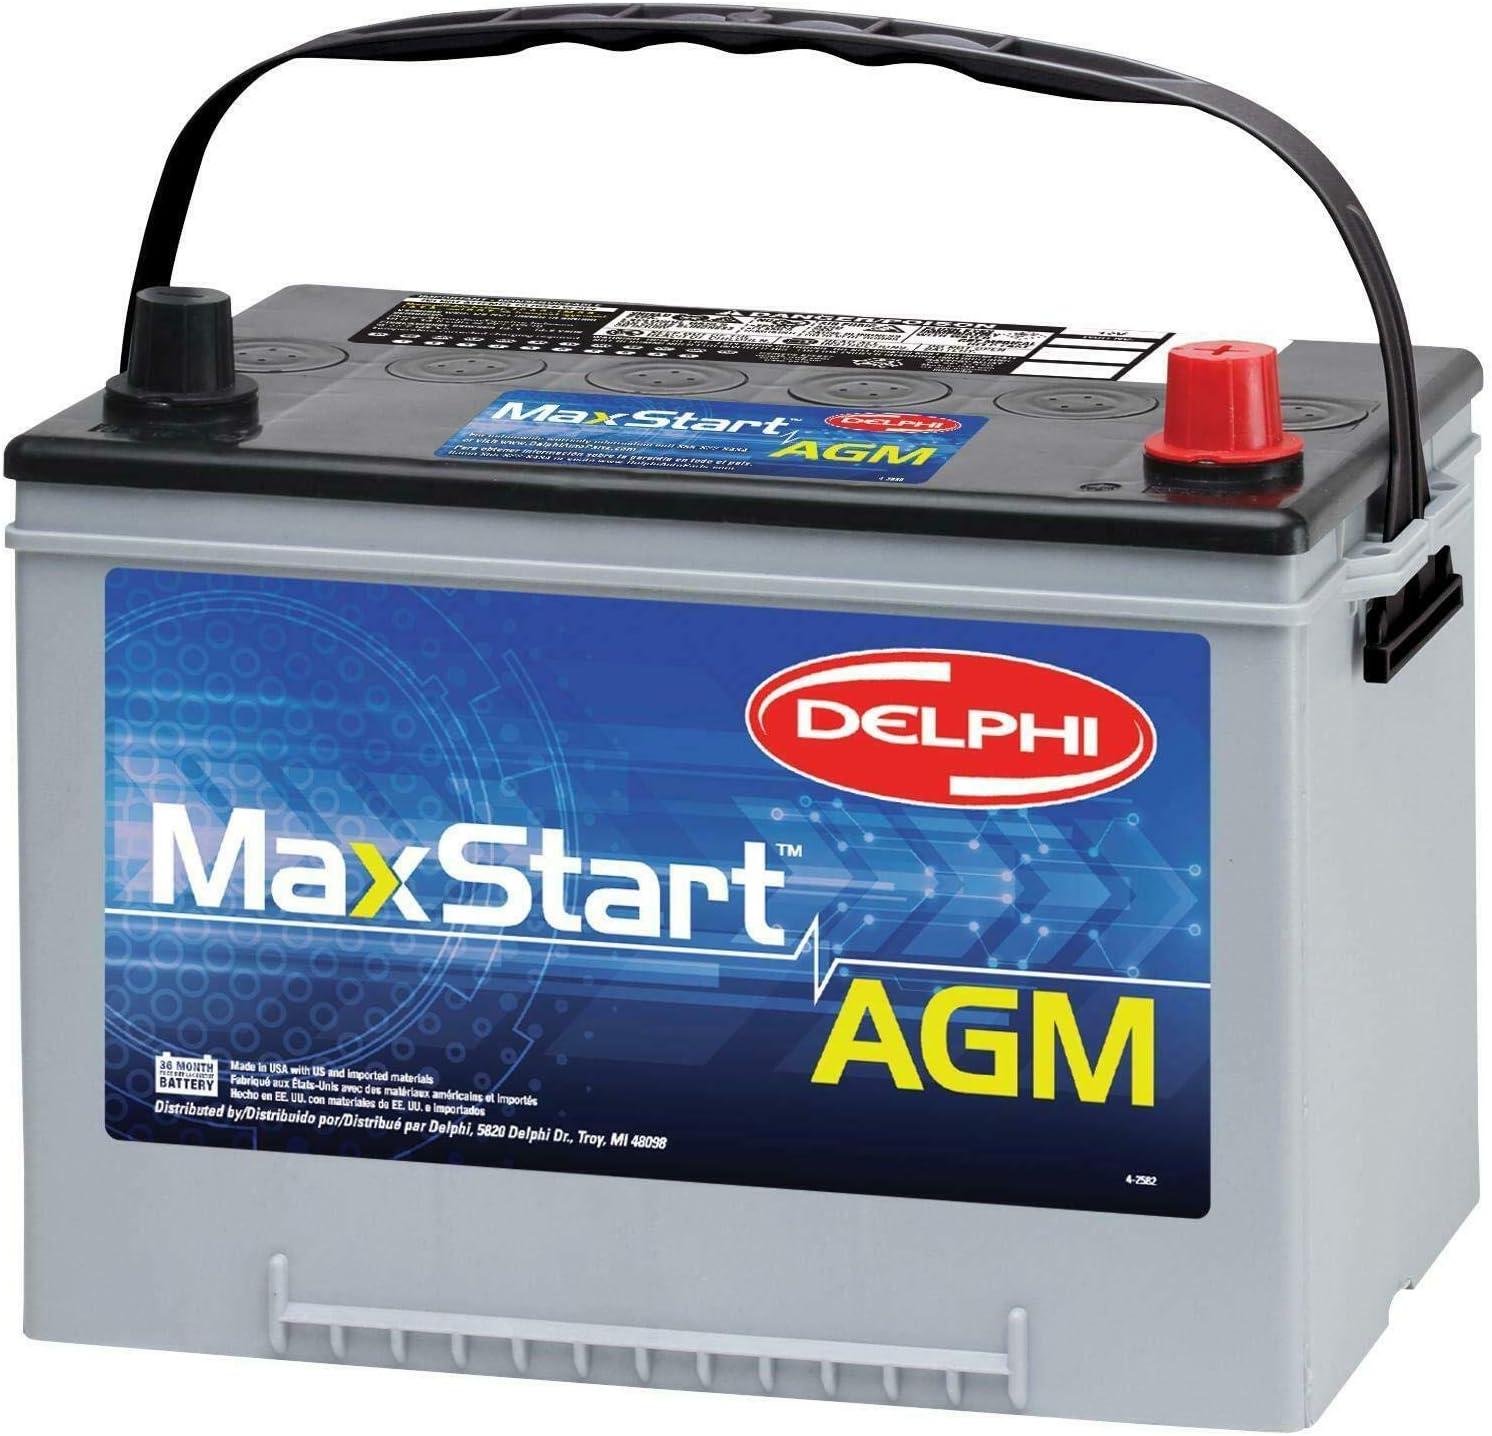 Delphi トレンド BU9034R MaxStart 流行のアイテム AGM Premium Battery Si Automotive Group